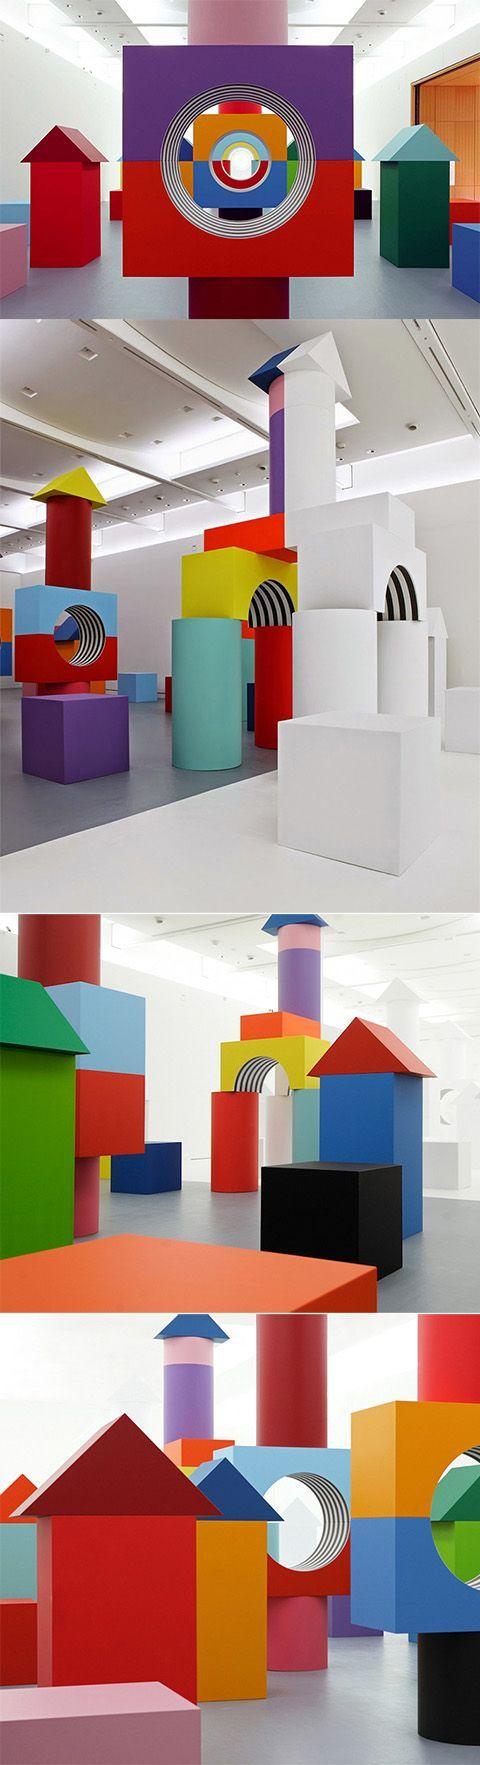 www.thecoolhunter.net/article/detail/2329/daniel-buren--childs-play-exhibition--naples